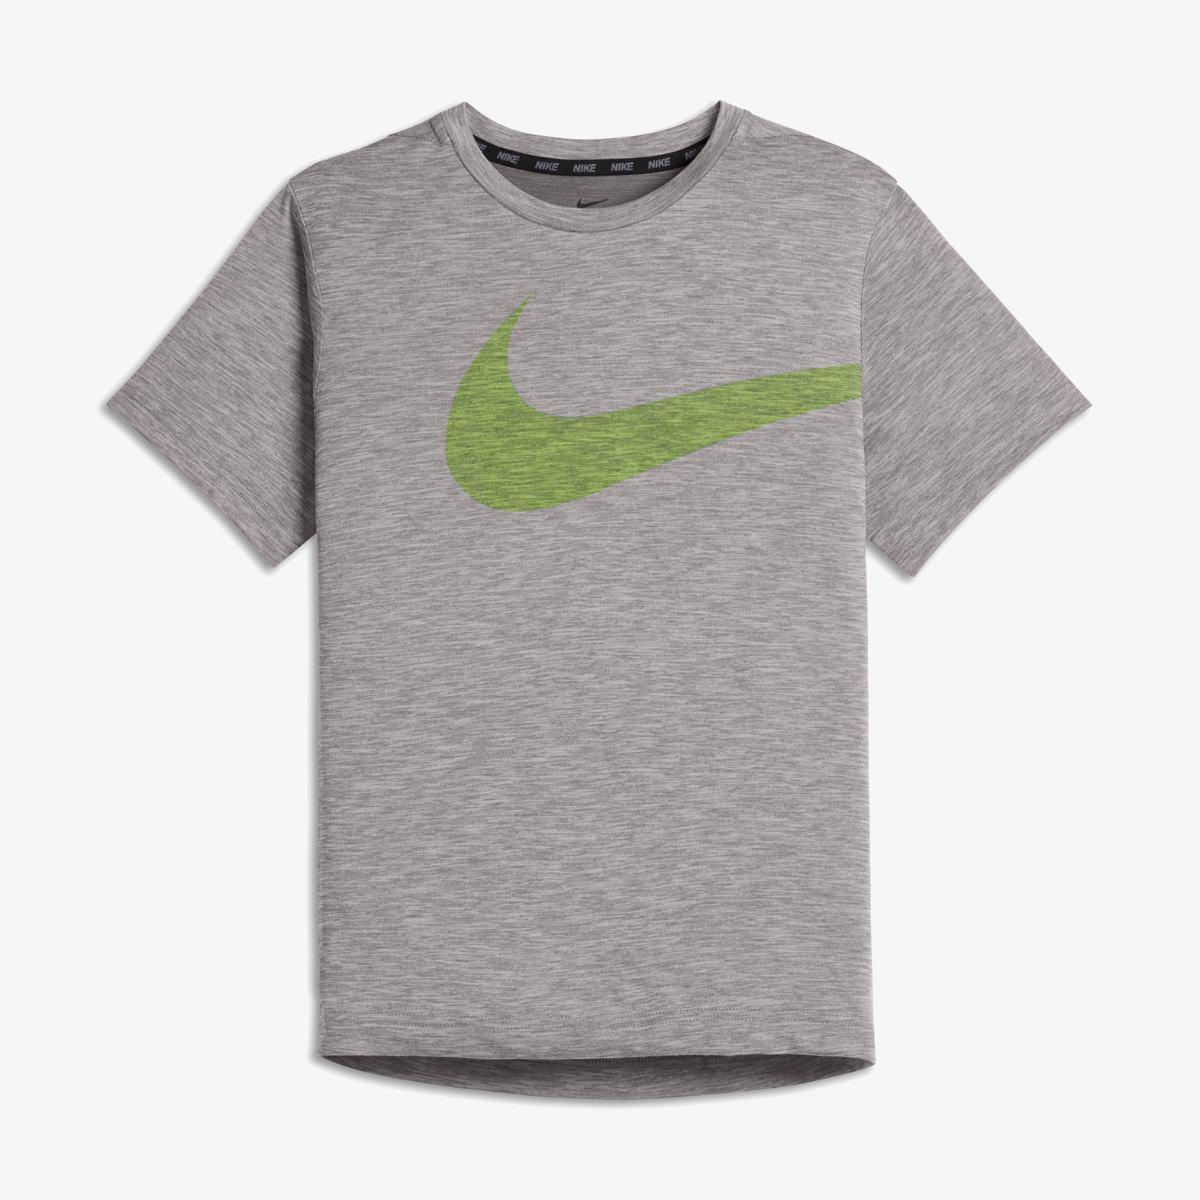 b1c5ce76 Купить Мужская футболка NIKE Breathe Top Hyper (Артикул: 834554-027 ...